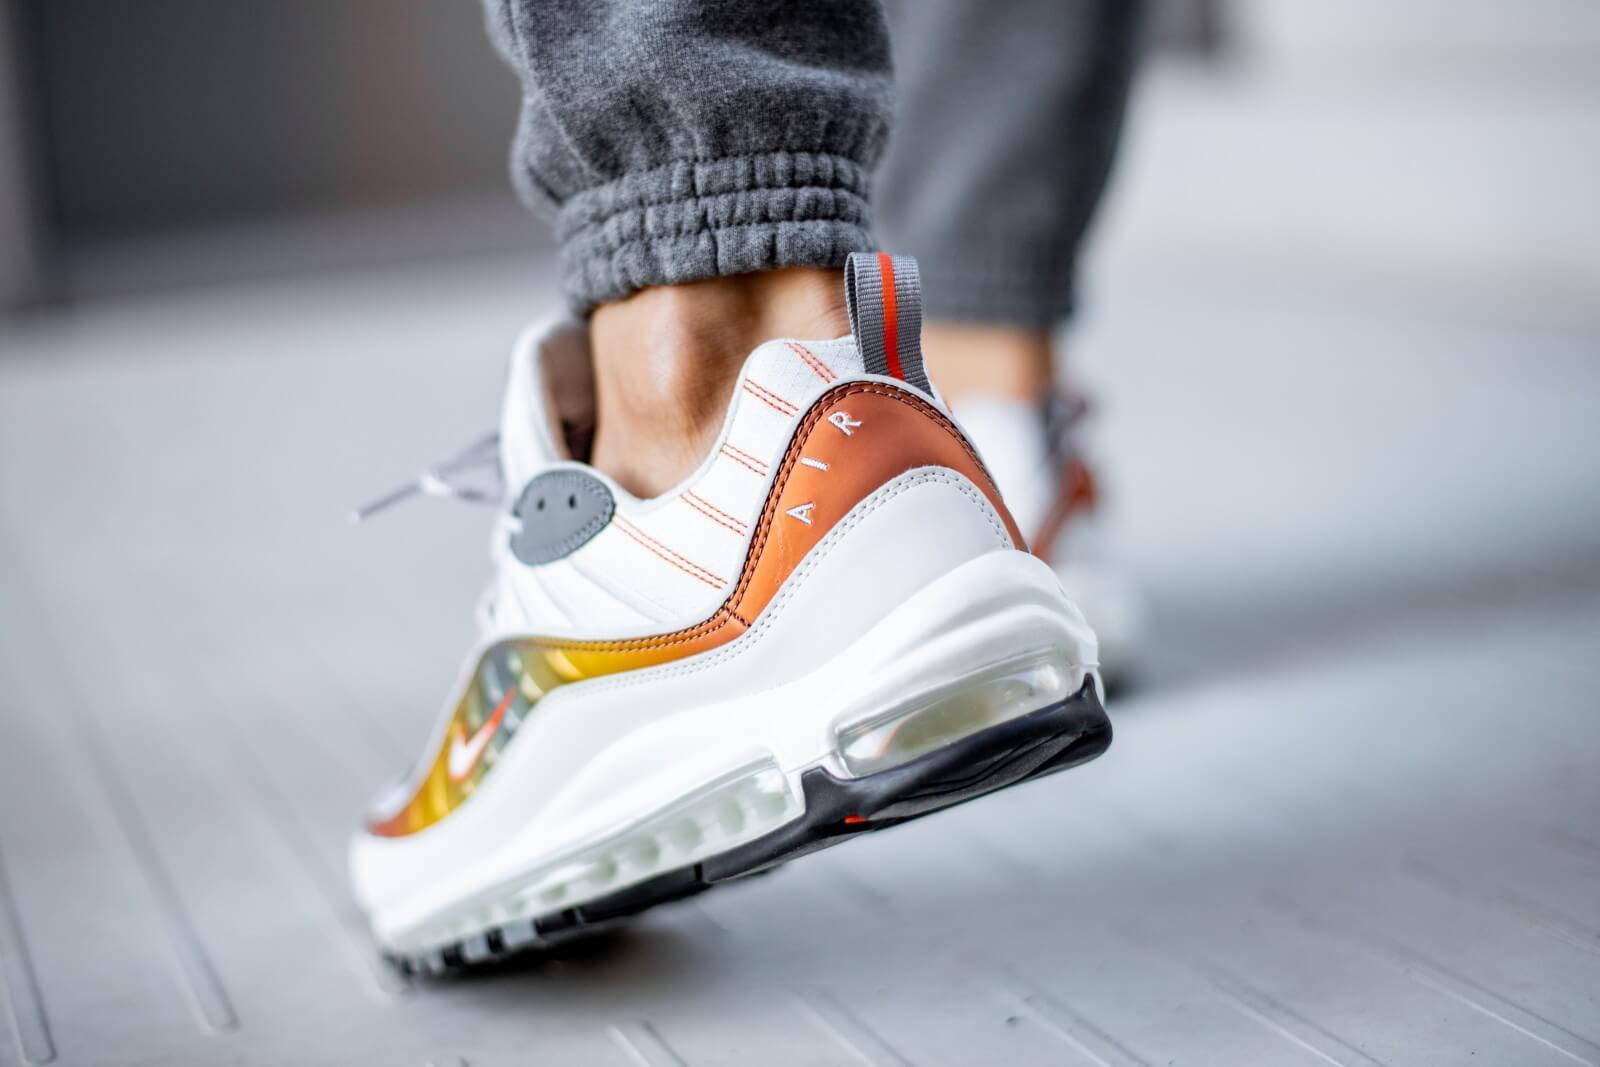 Nike Air Max 98 SE Vast Grey/Team Orange